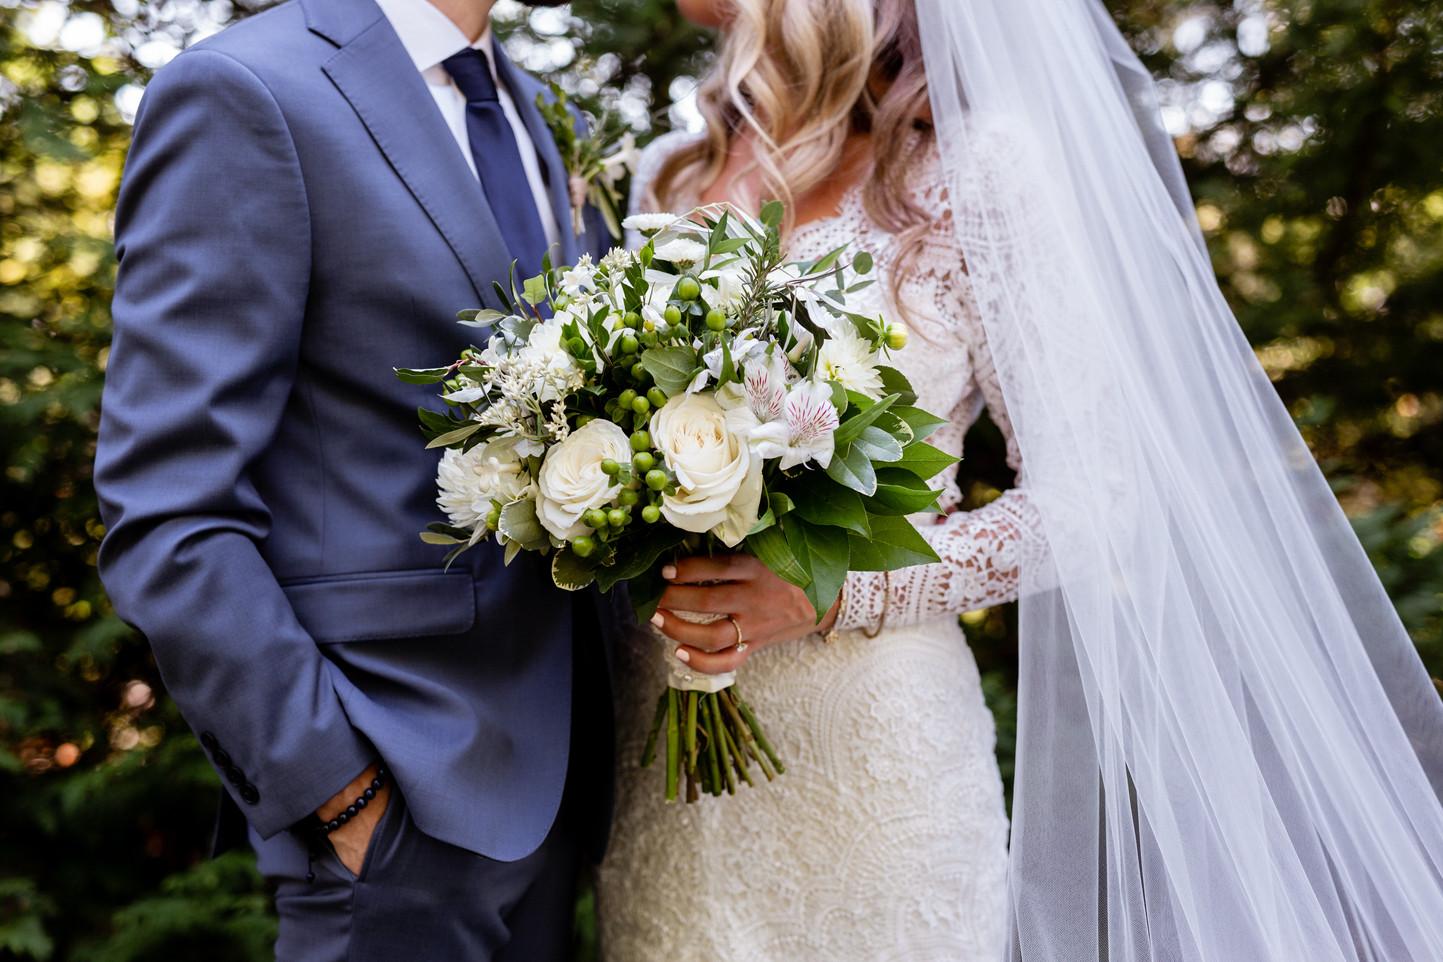 Arlen-Katelyn-Wedding-368.jpg